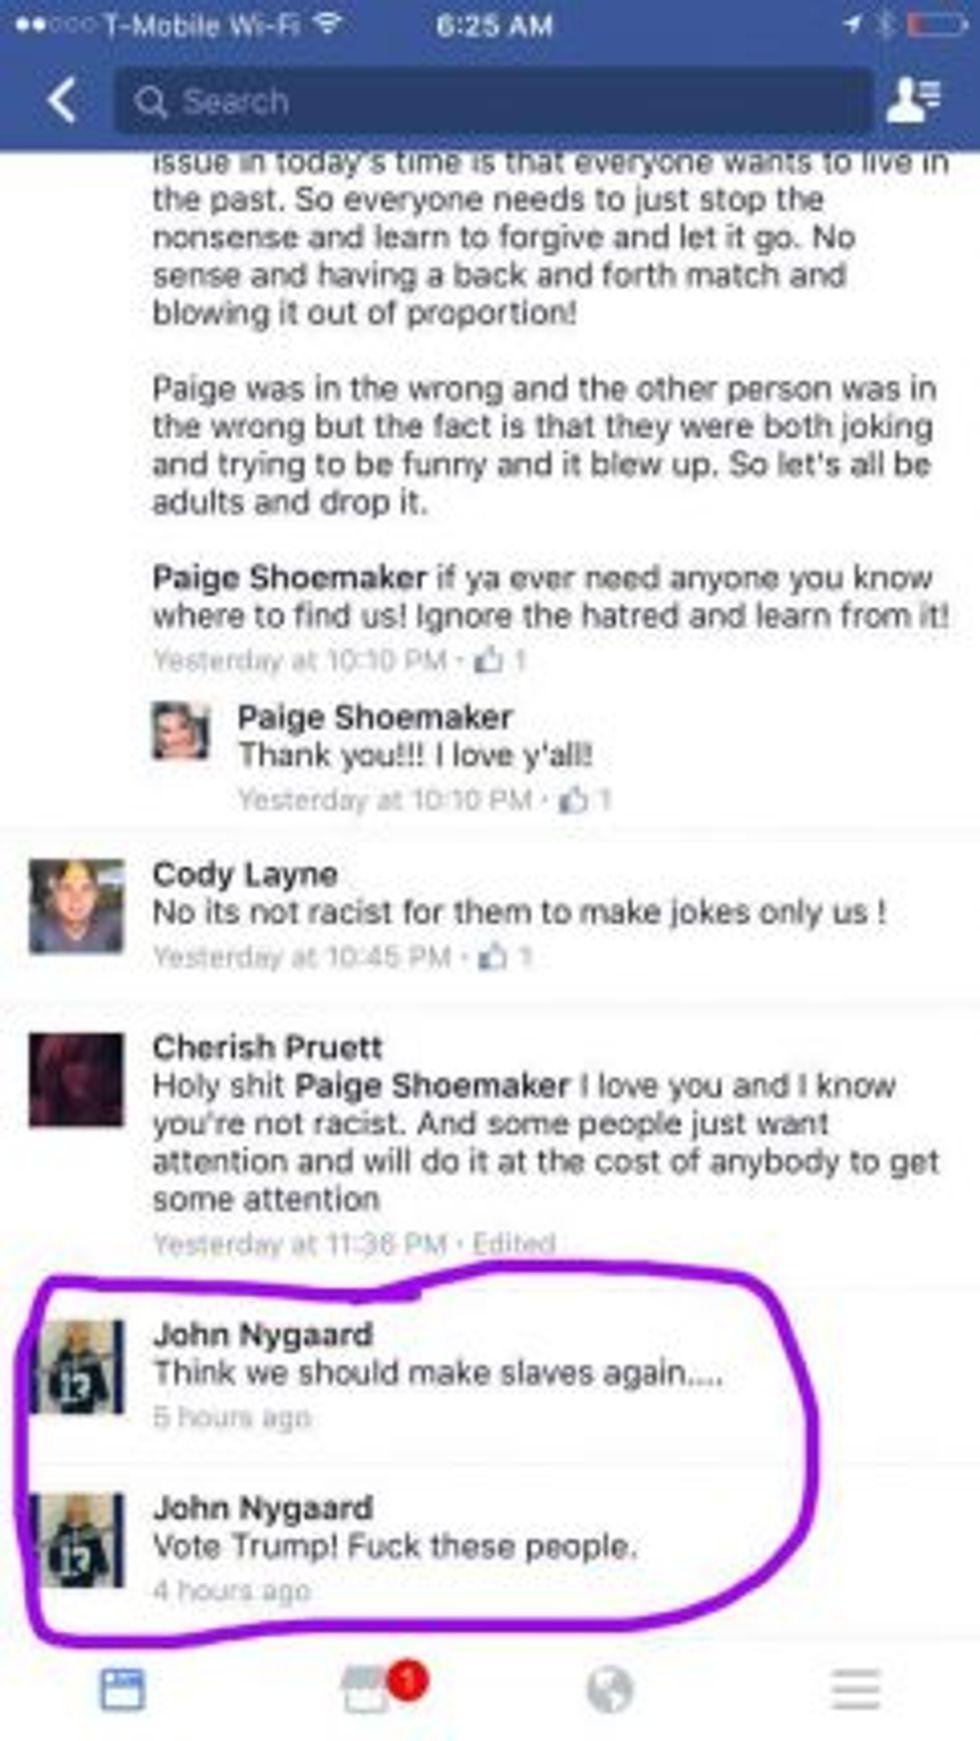 Screen capture of John Nygaard comments